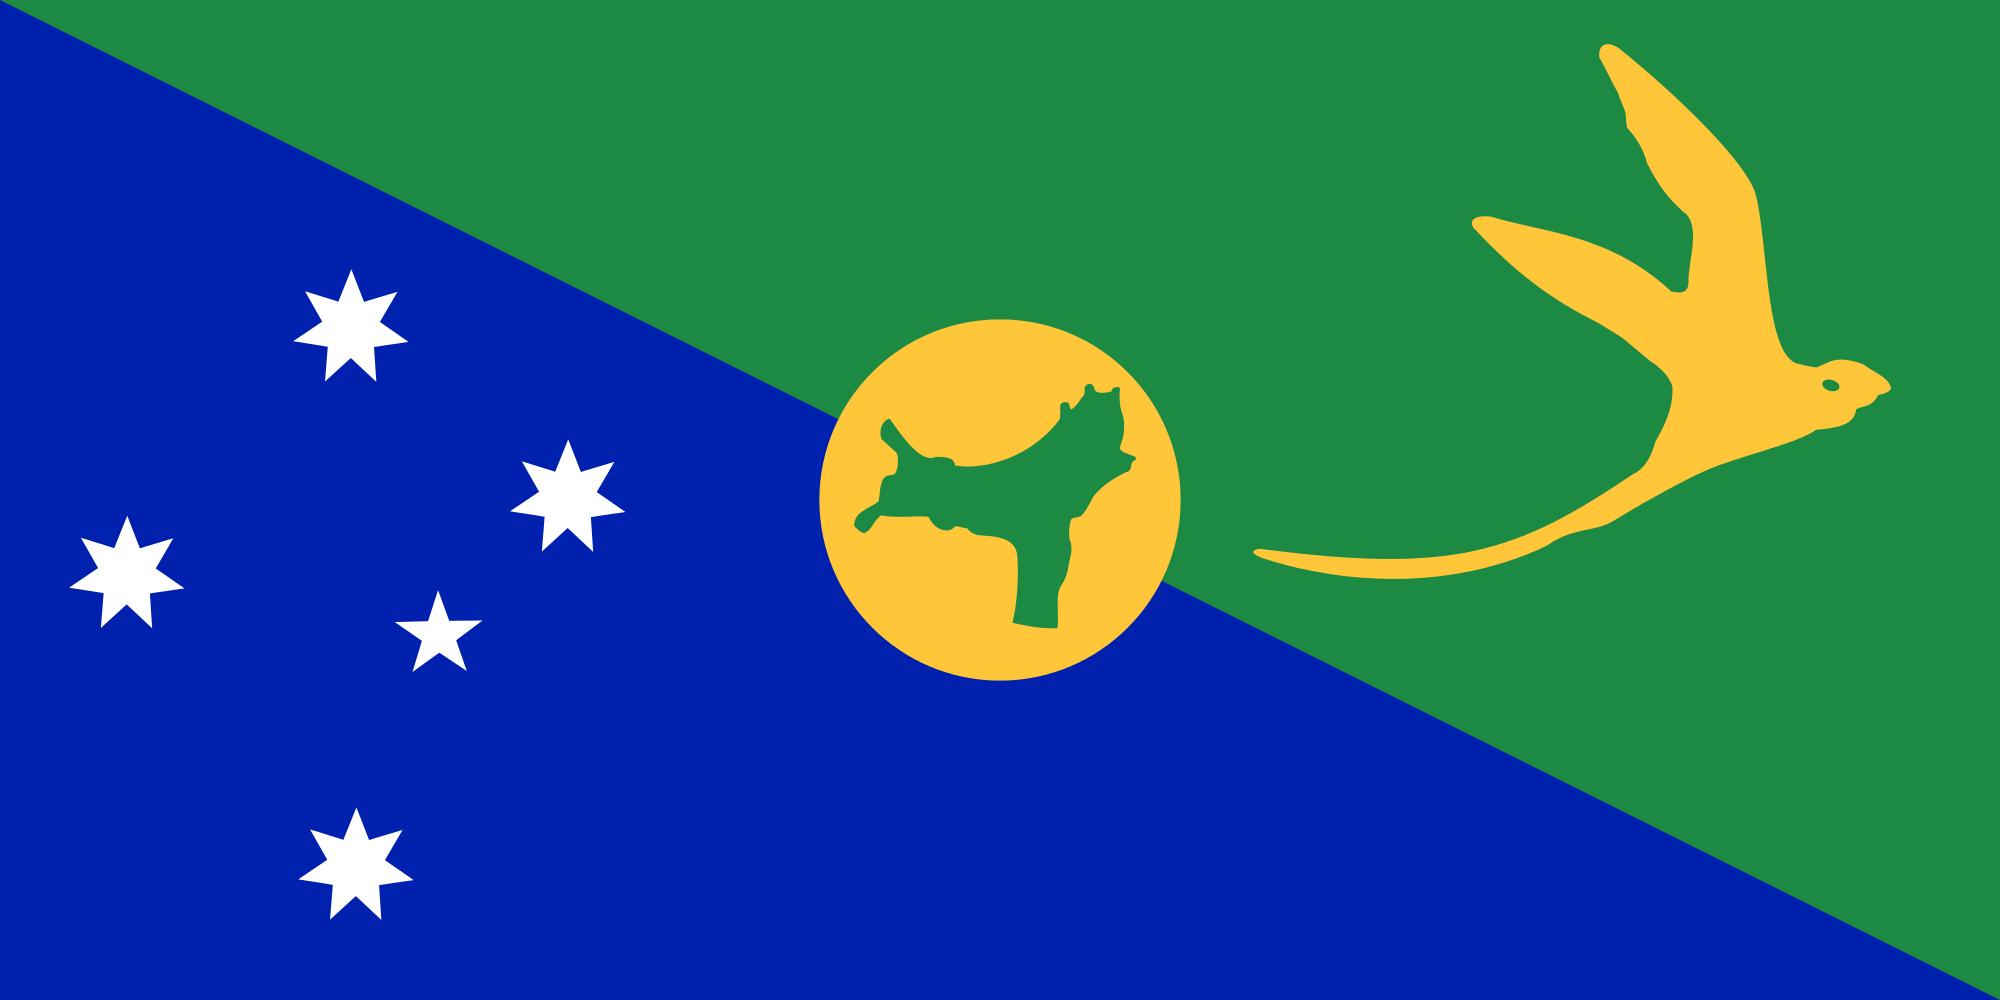 isla de navidad, país, emblema, insignia, символ - Обои HD - Профессор falken.com